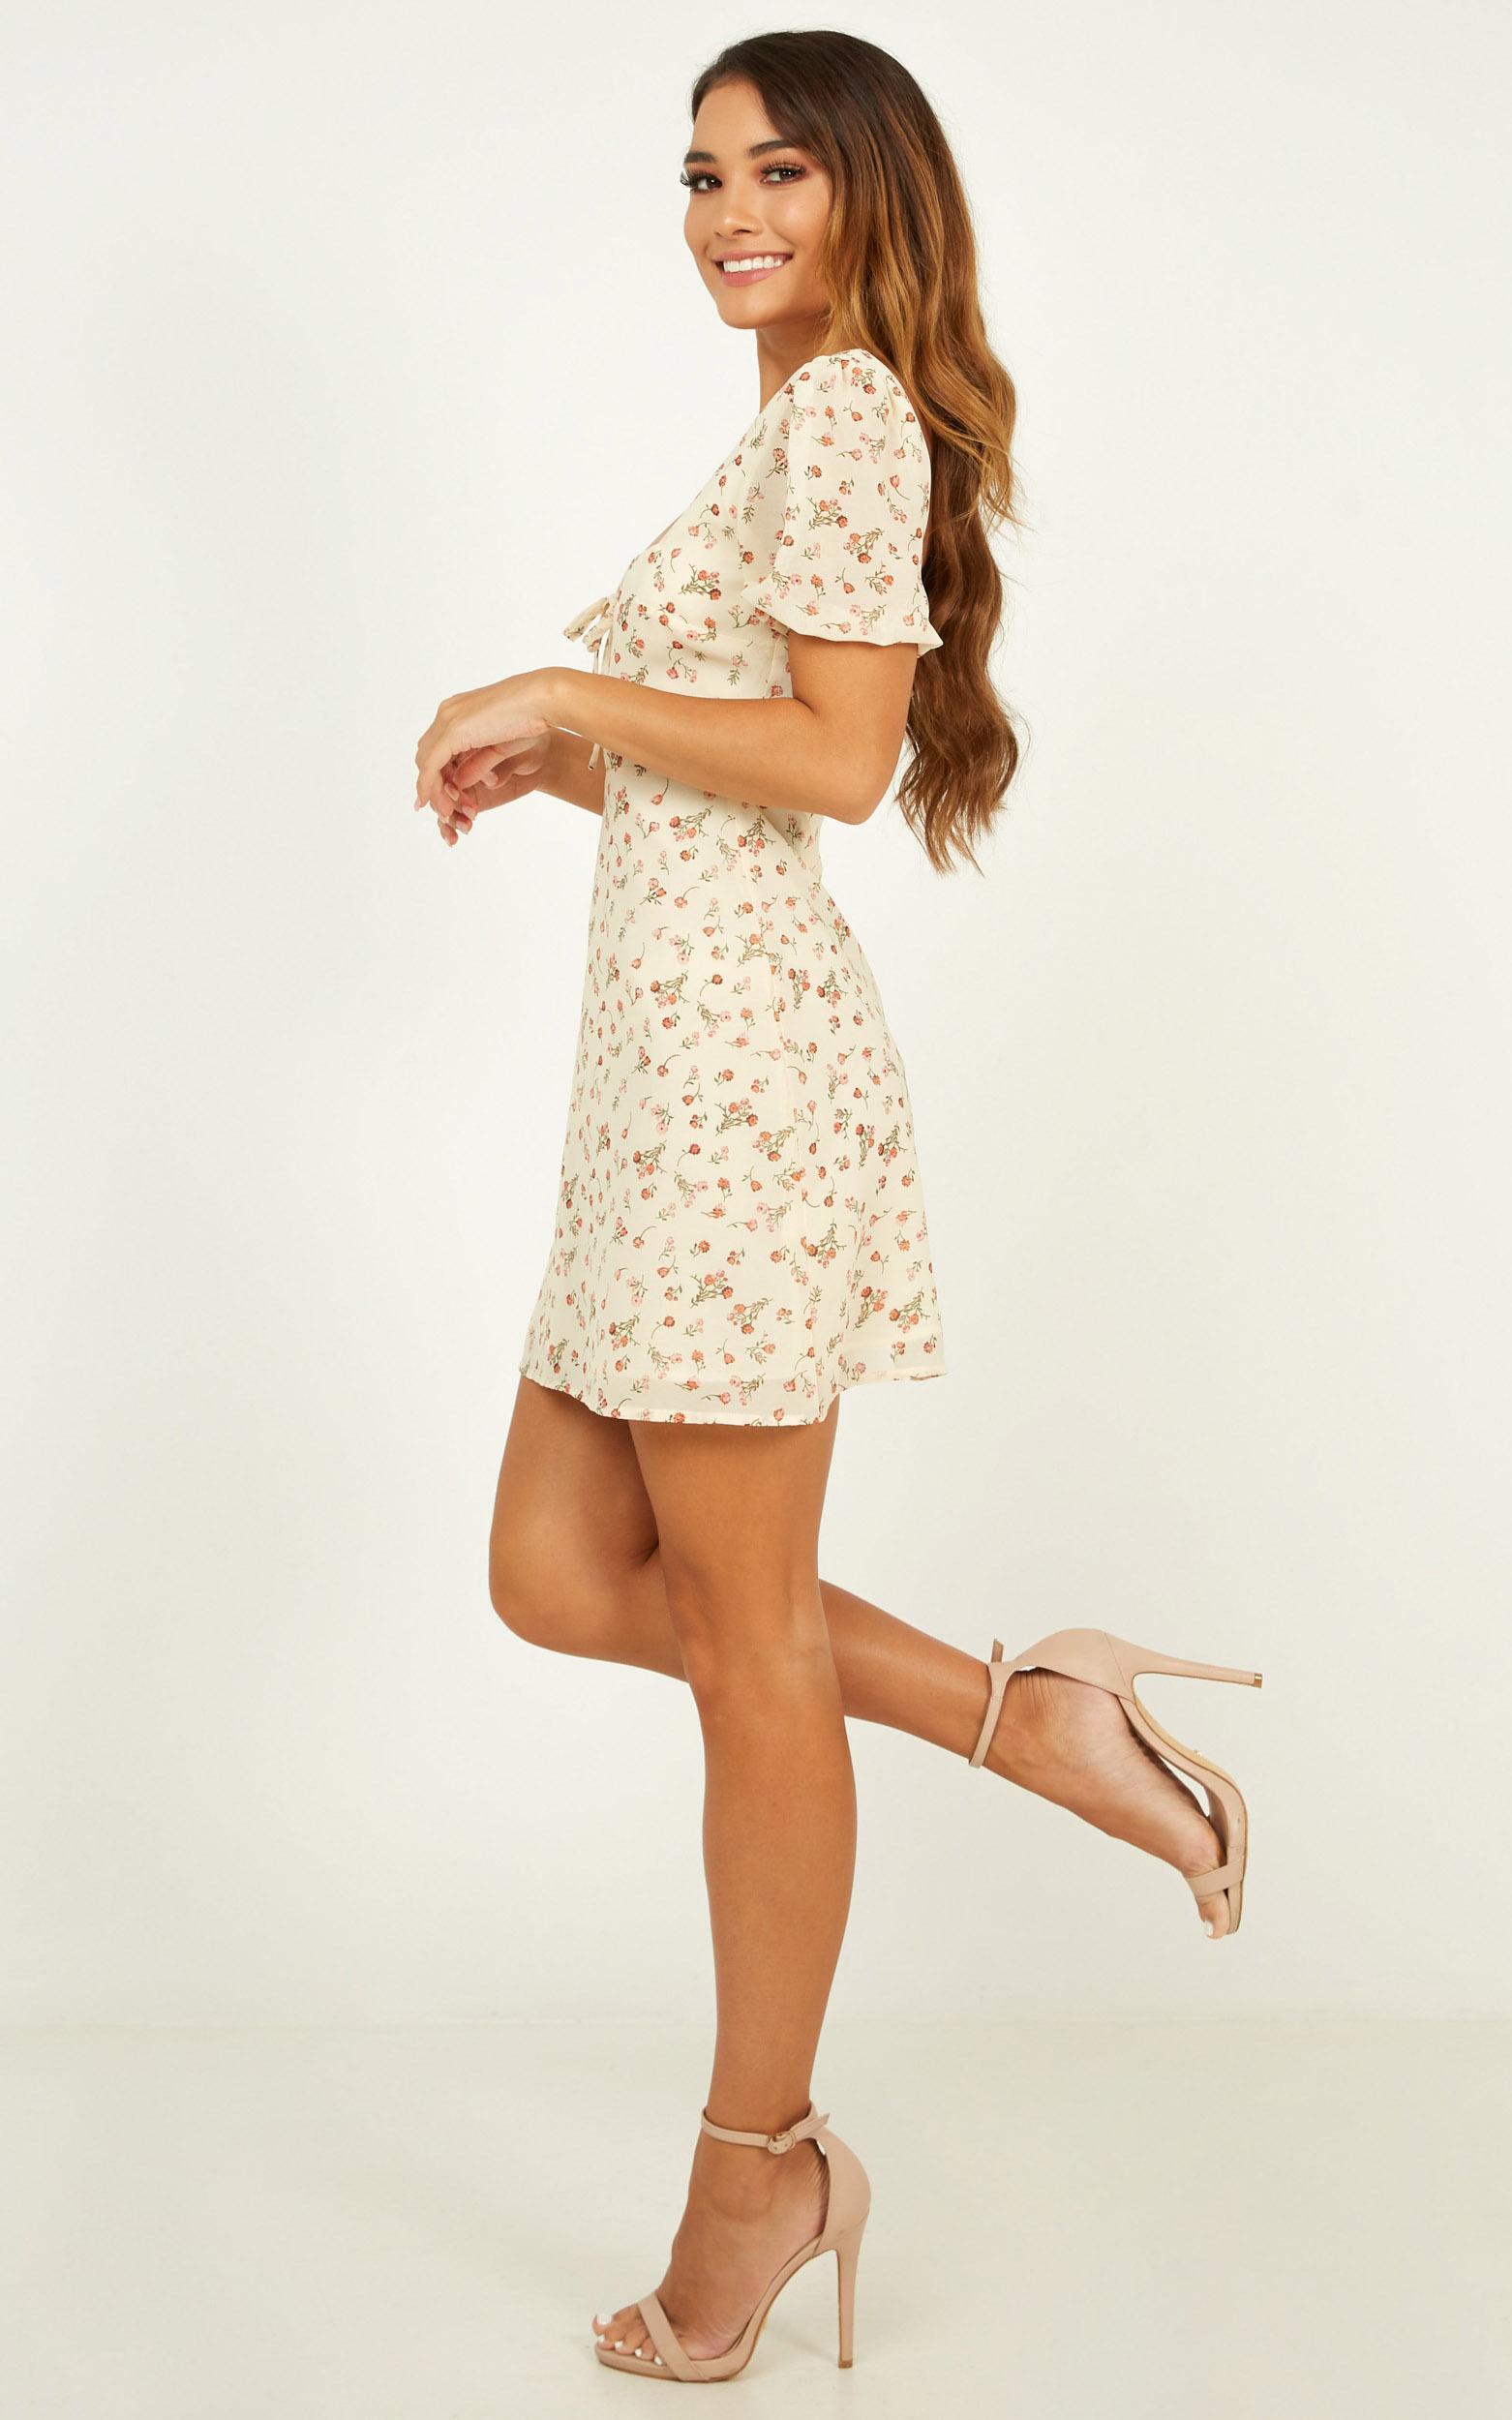 Sunset Boulevard Dress In cream floral - 20 (XXXXL), Cream, hi-res image number null